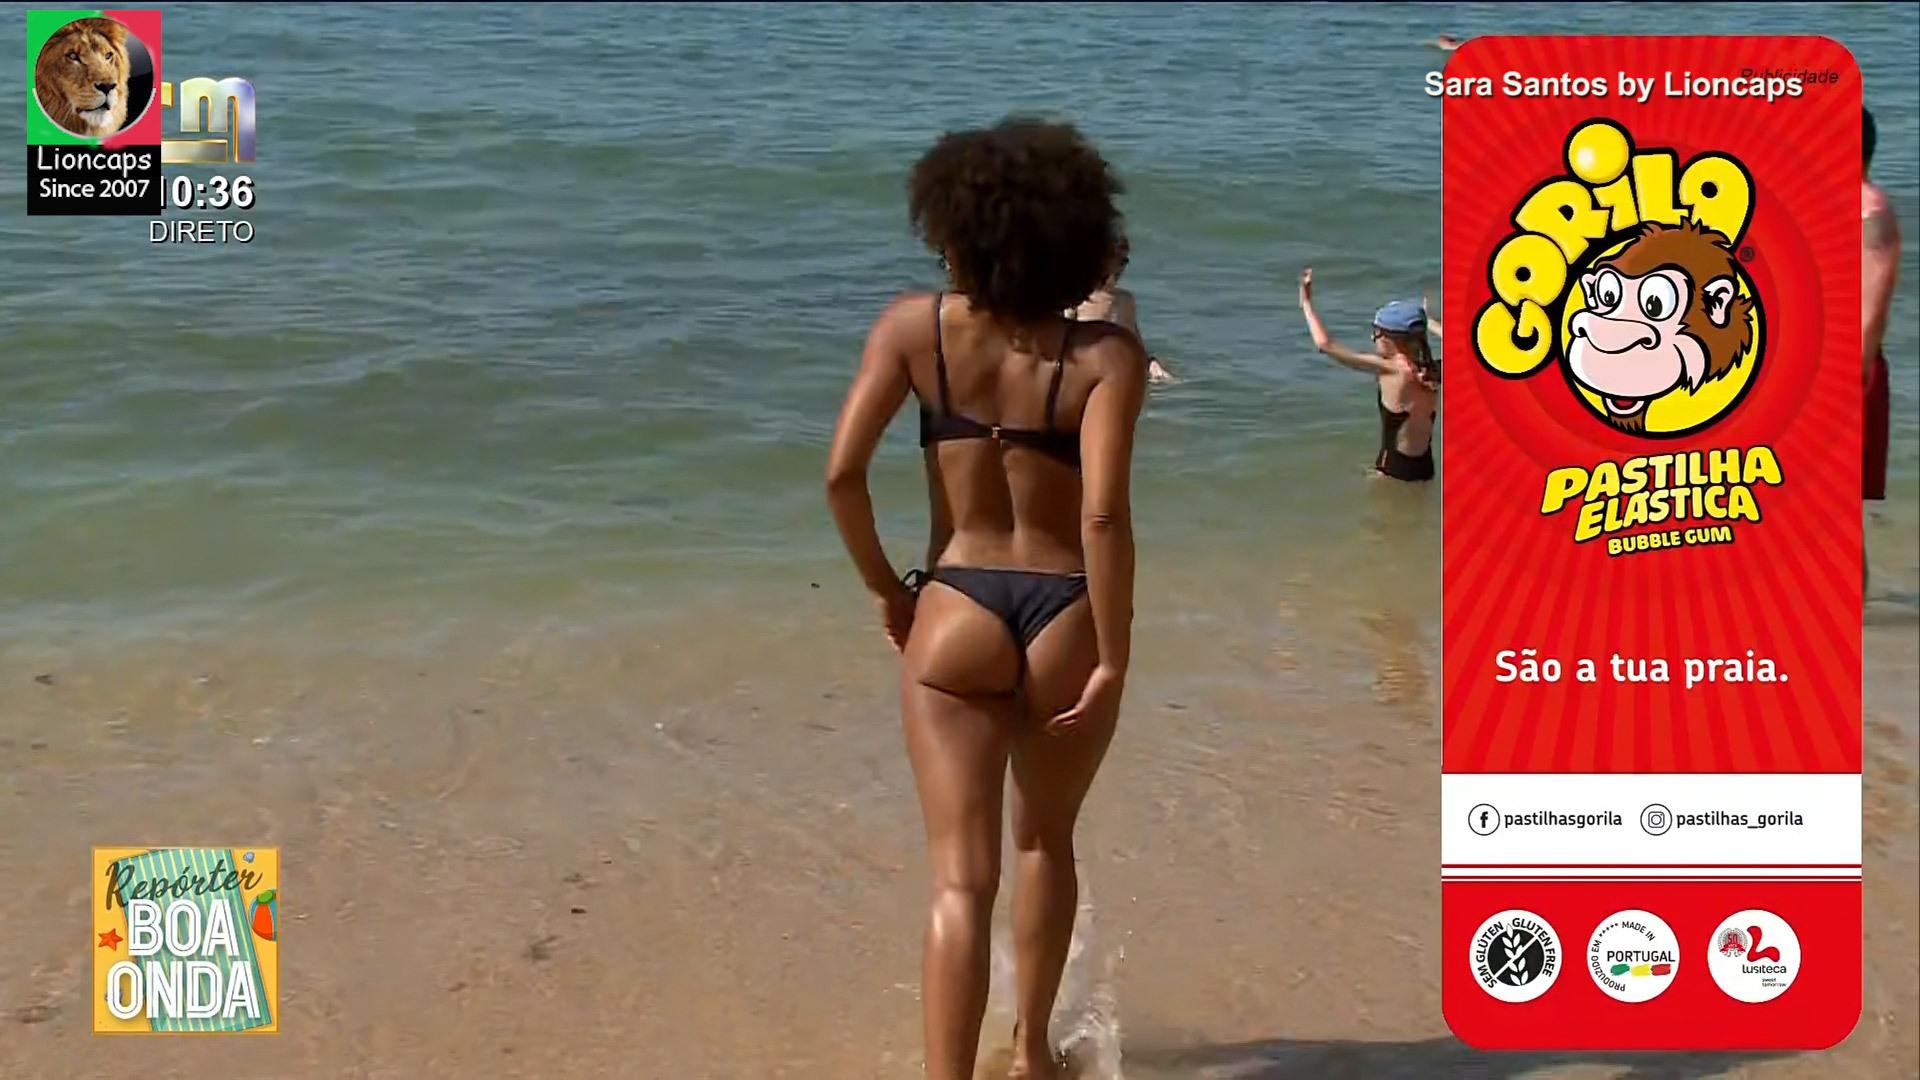 sara_santos_praia_lioncaps_24_07_2021_02 (5).jpg